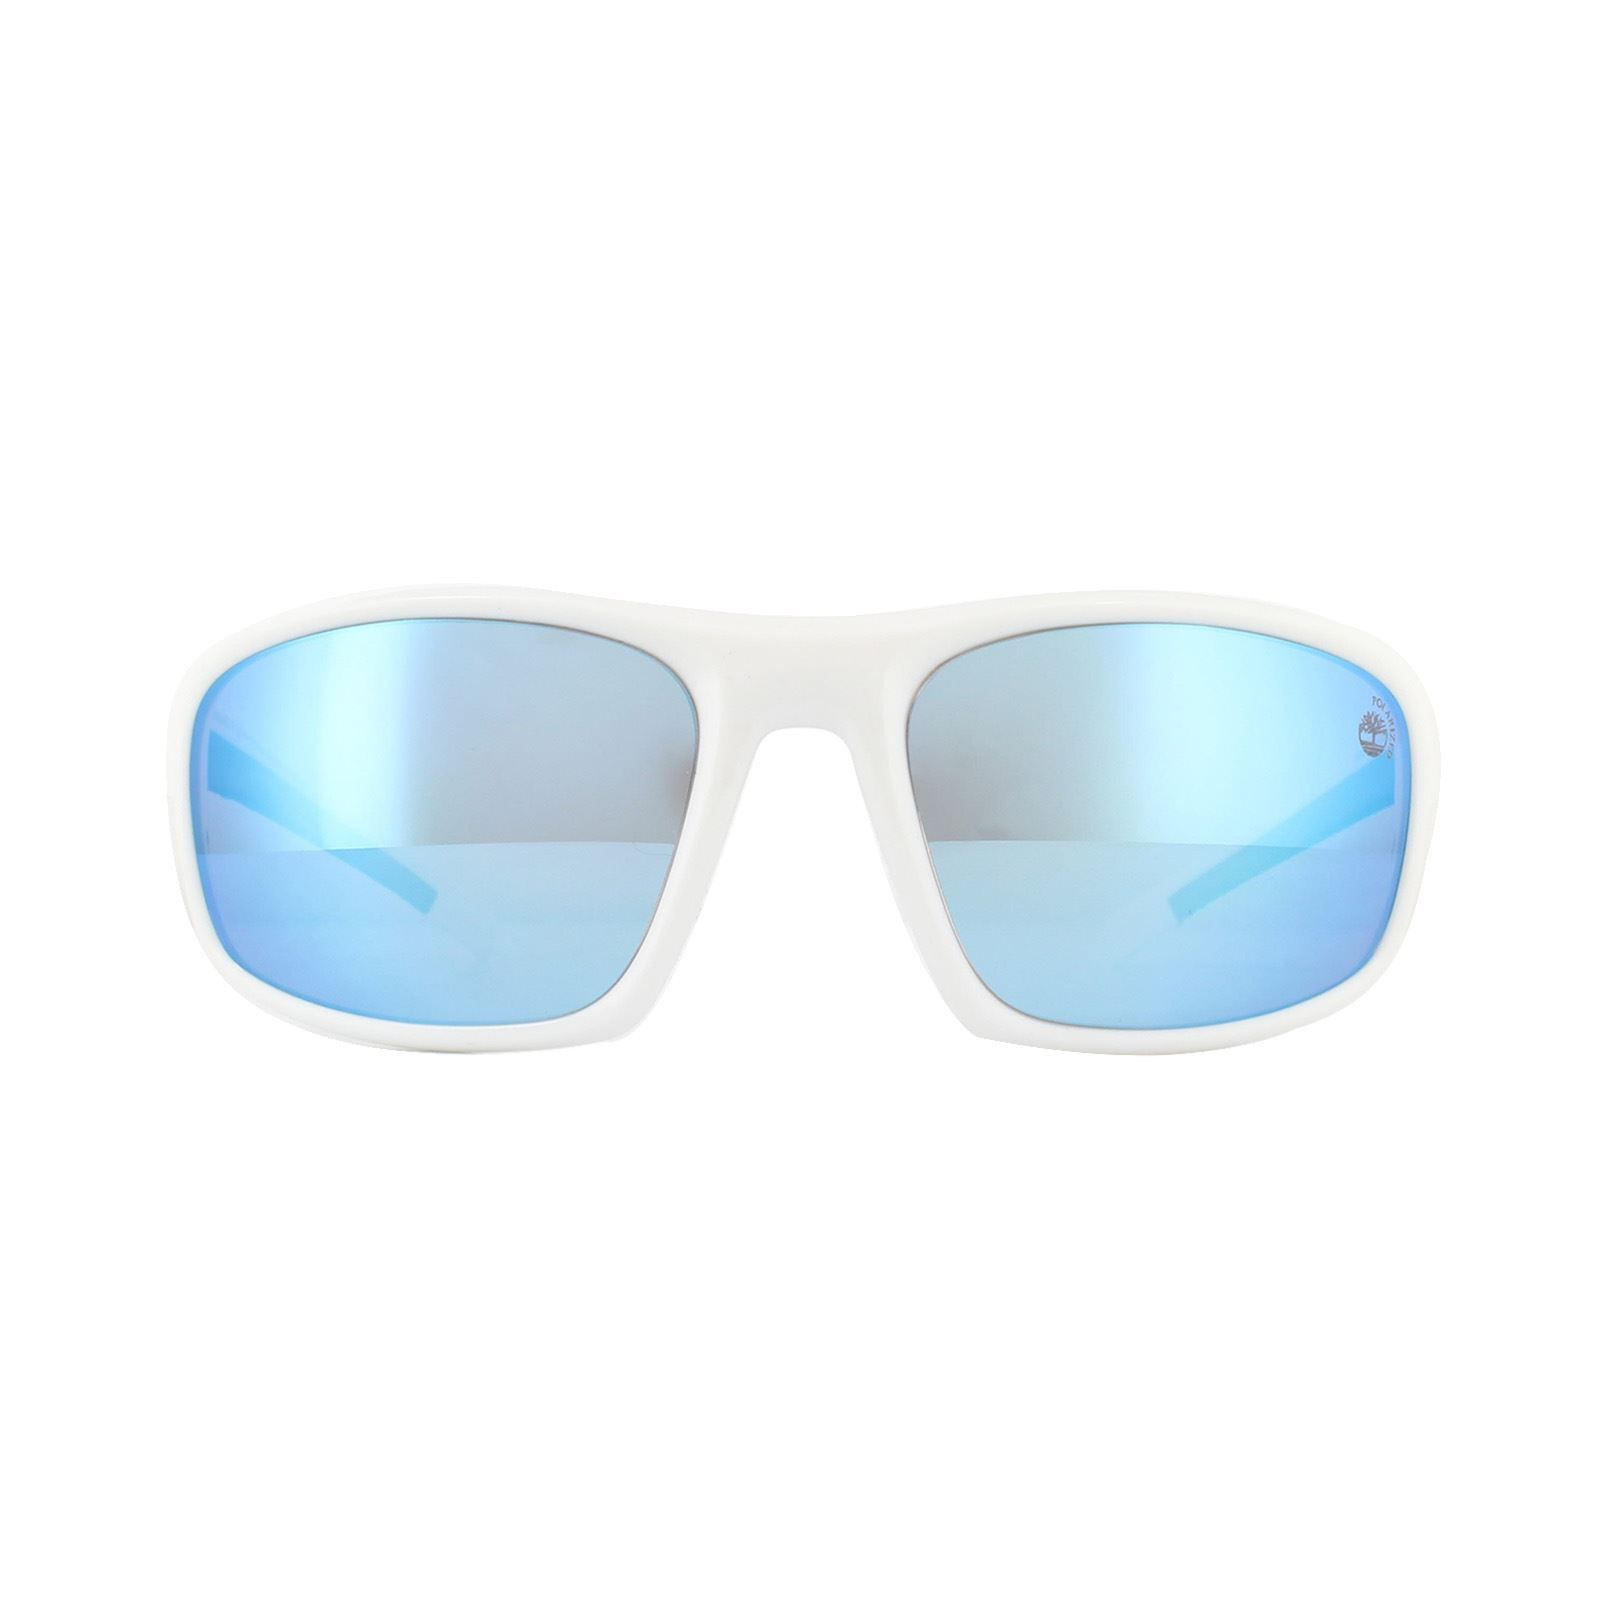 Timberland Sunglasses TB9134 21H White Blue Mirror Polarized